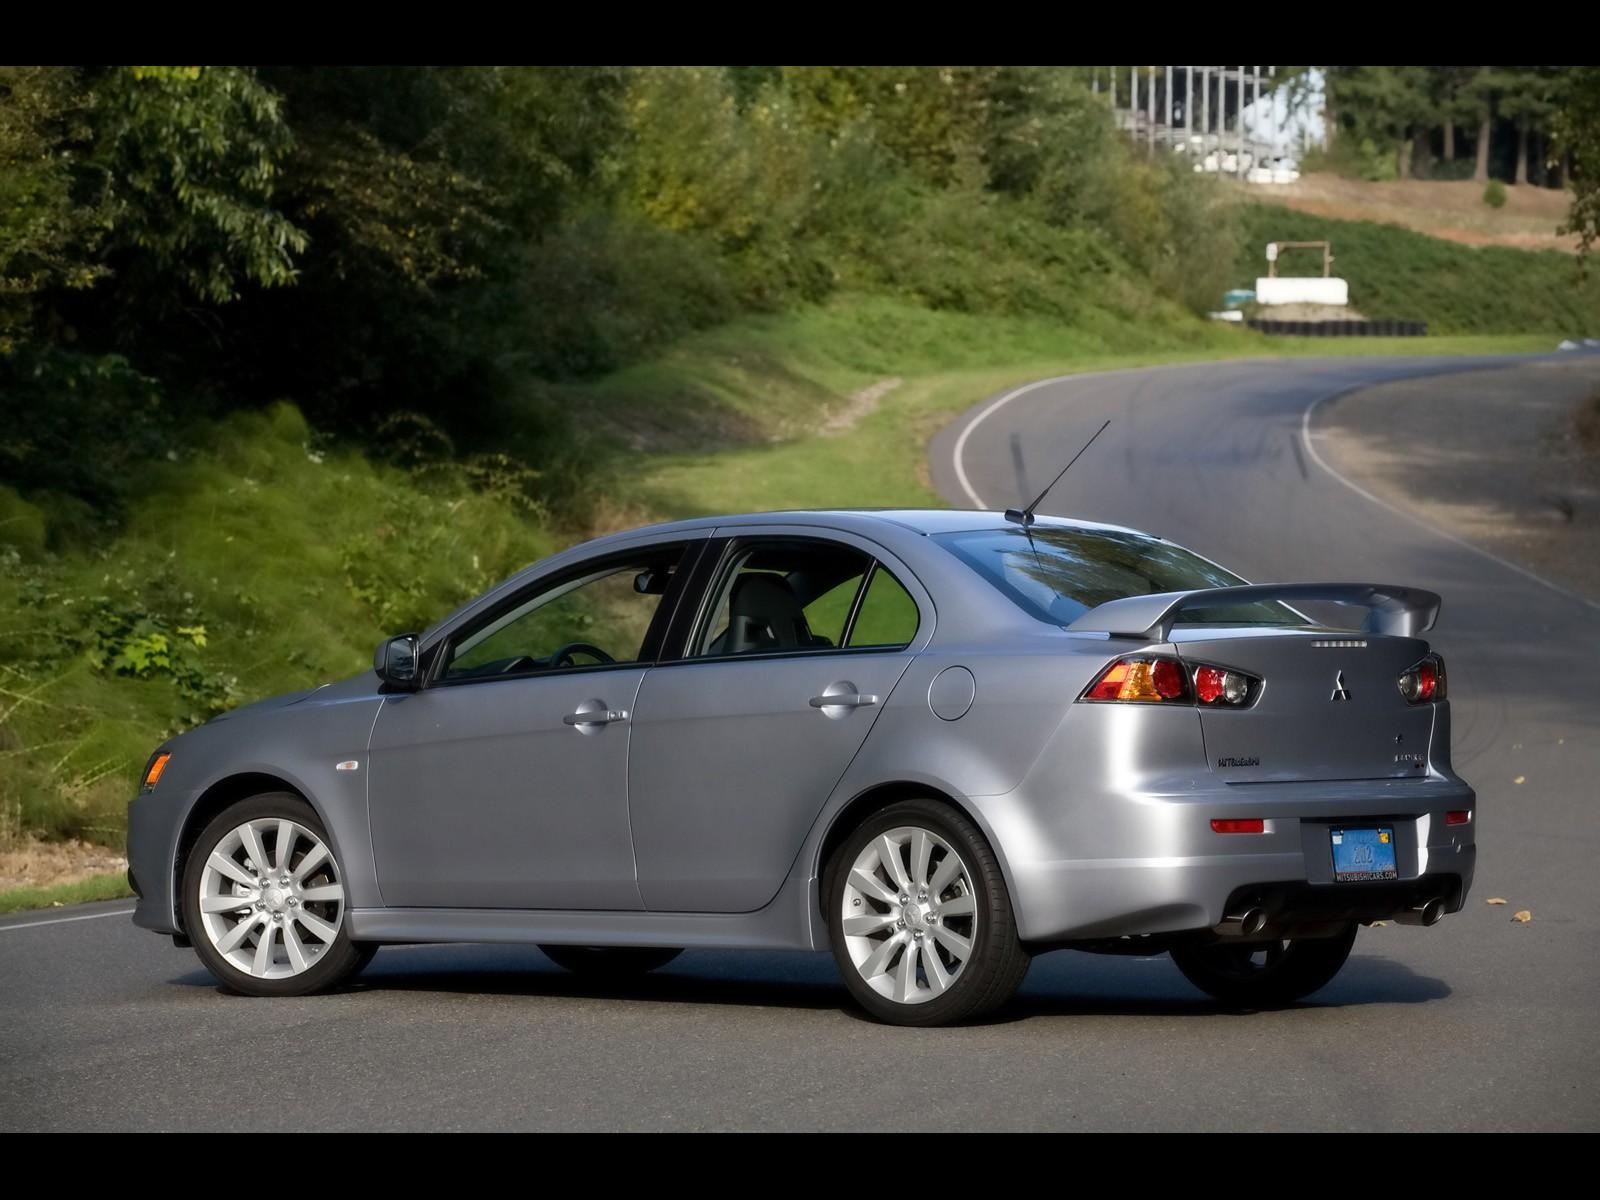 Mitsubishi Lancer Ralliart X 2008 - 2011 Hatchback 5 door #1